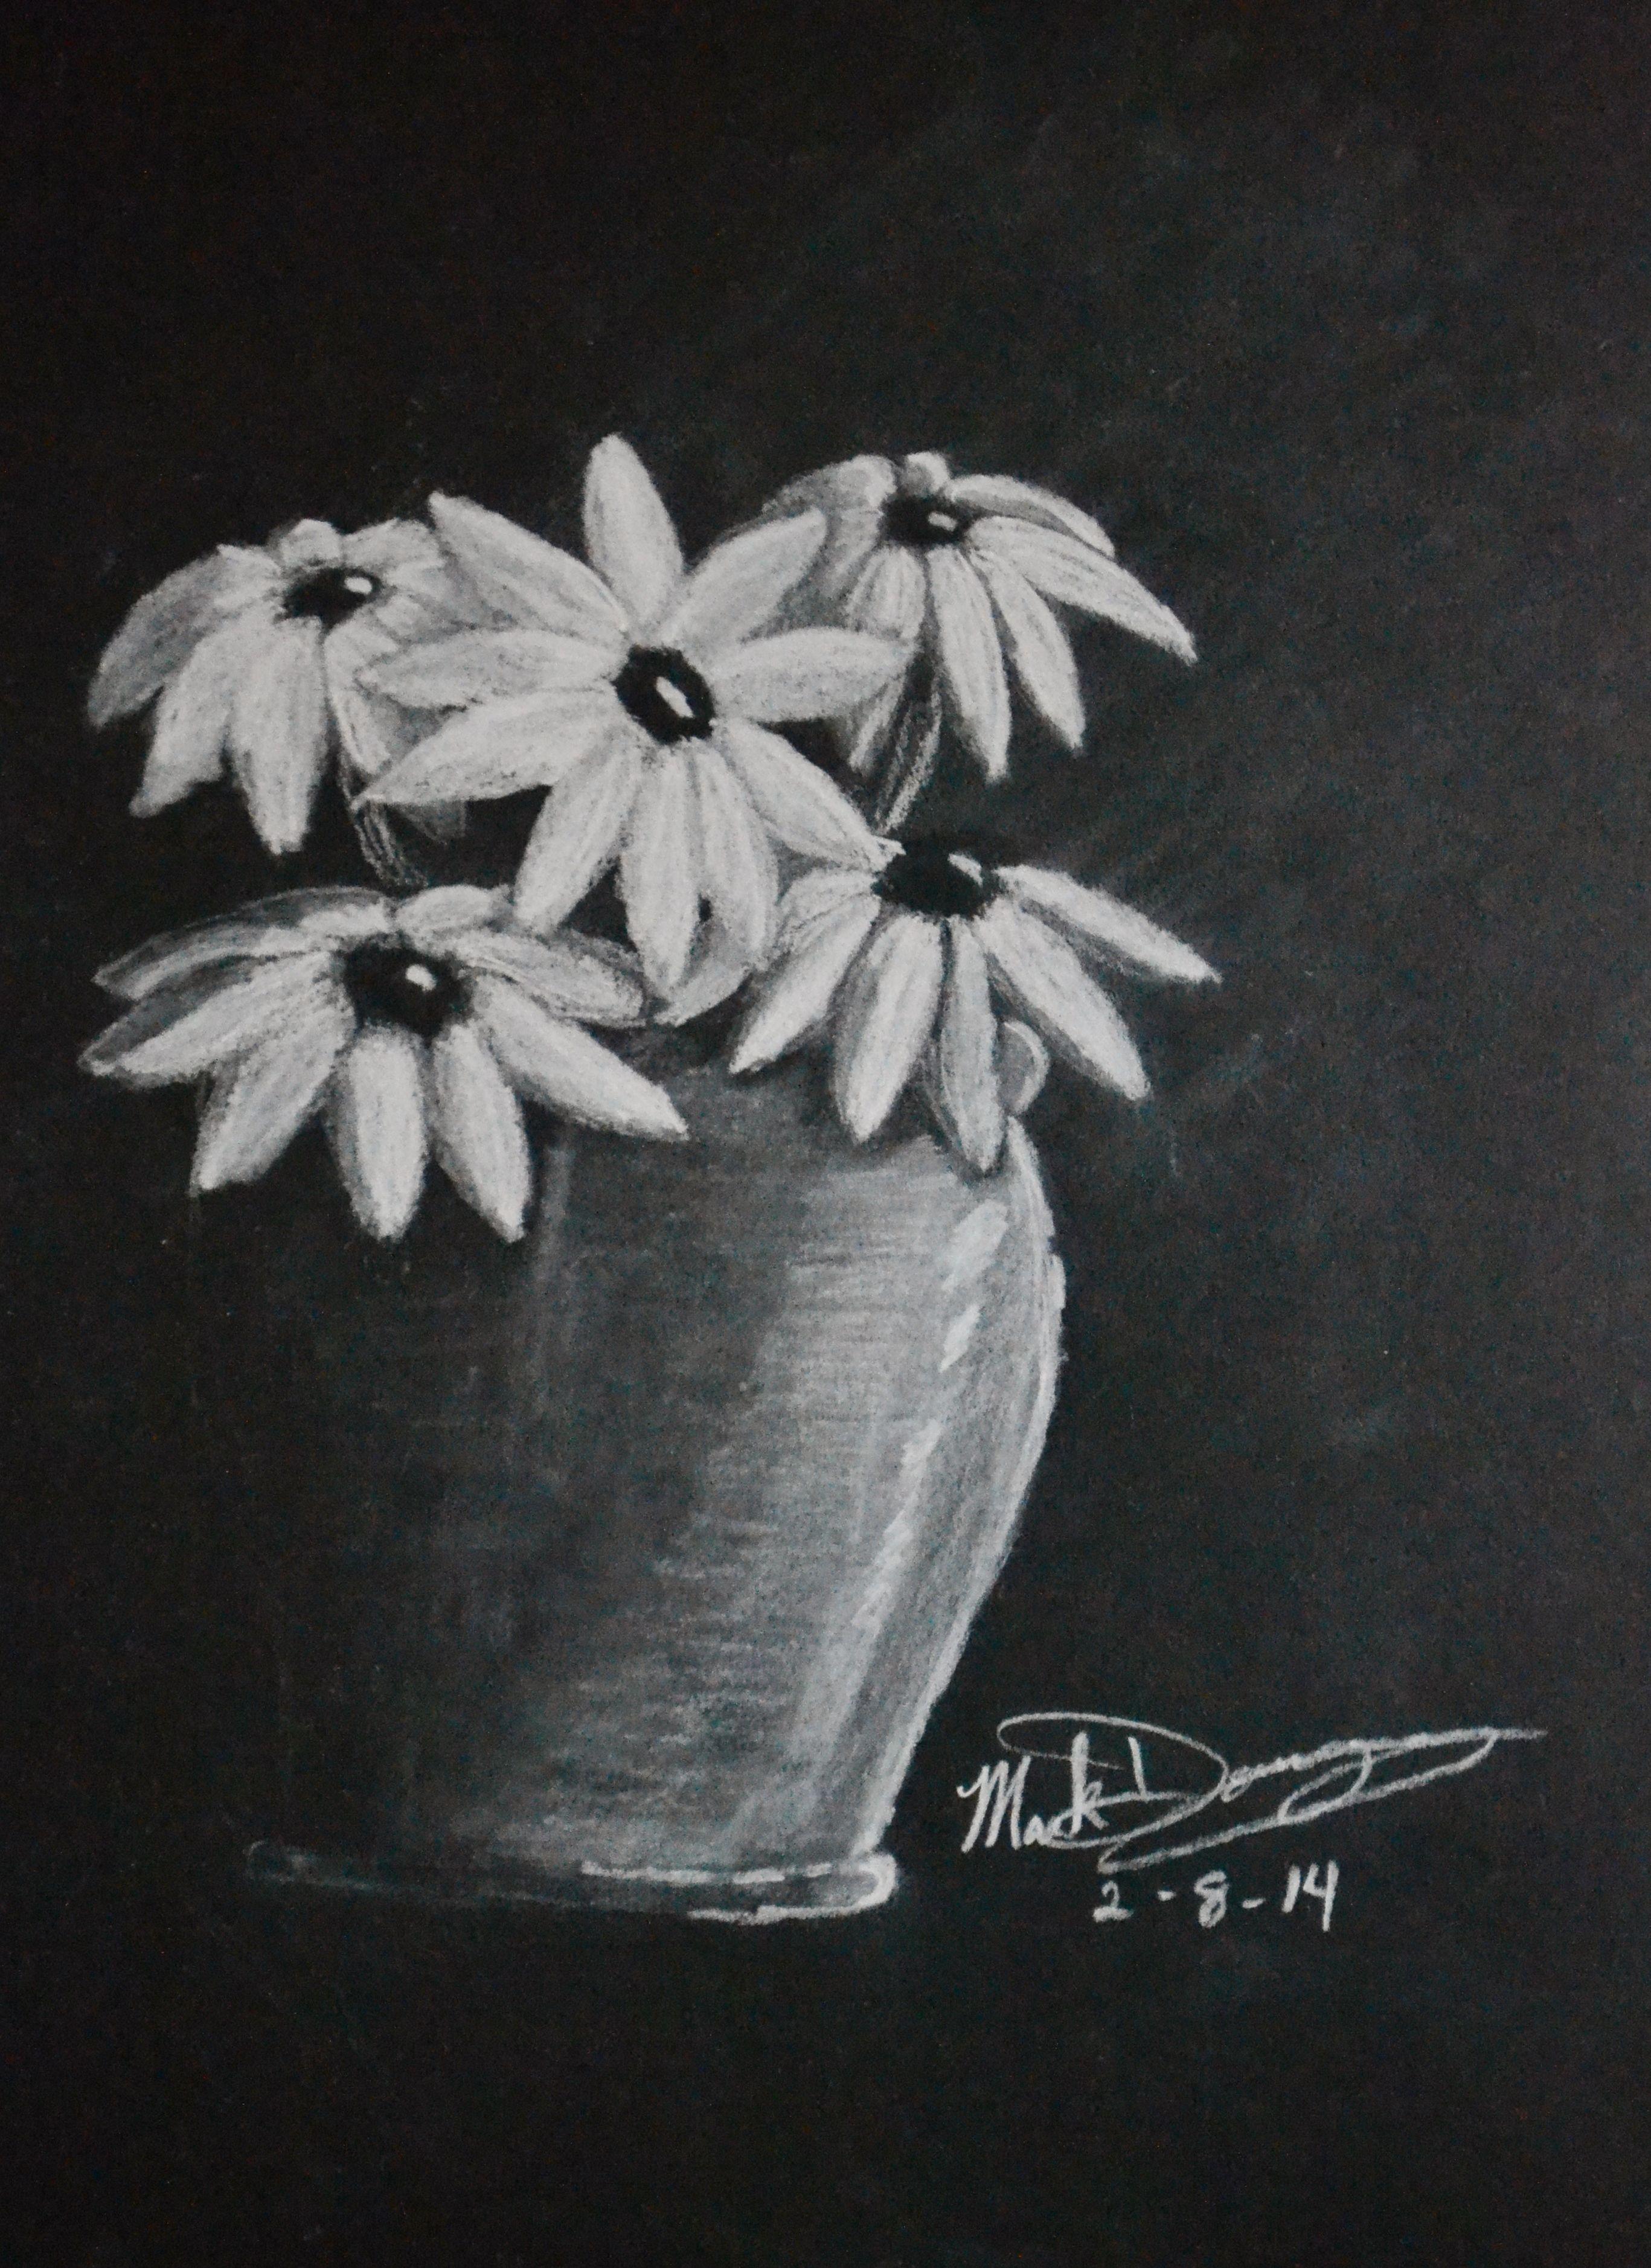 The Flower Pot 9x12 White Charcoal On Black Paper Pencil Art